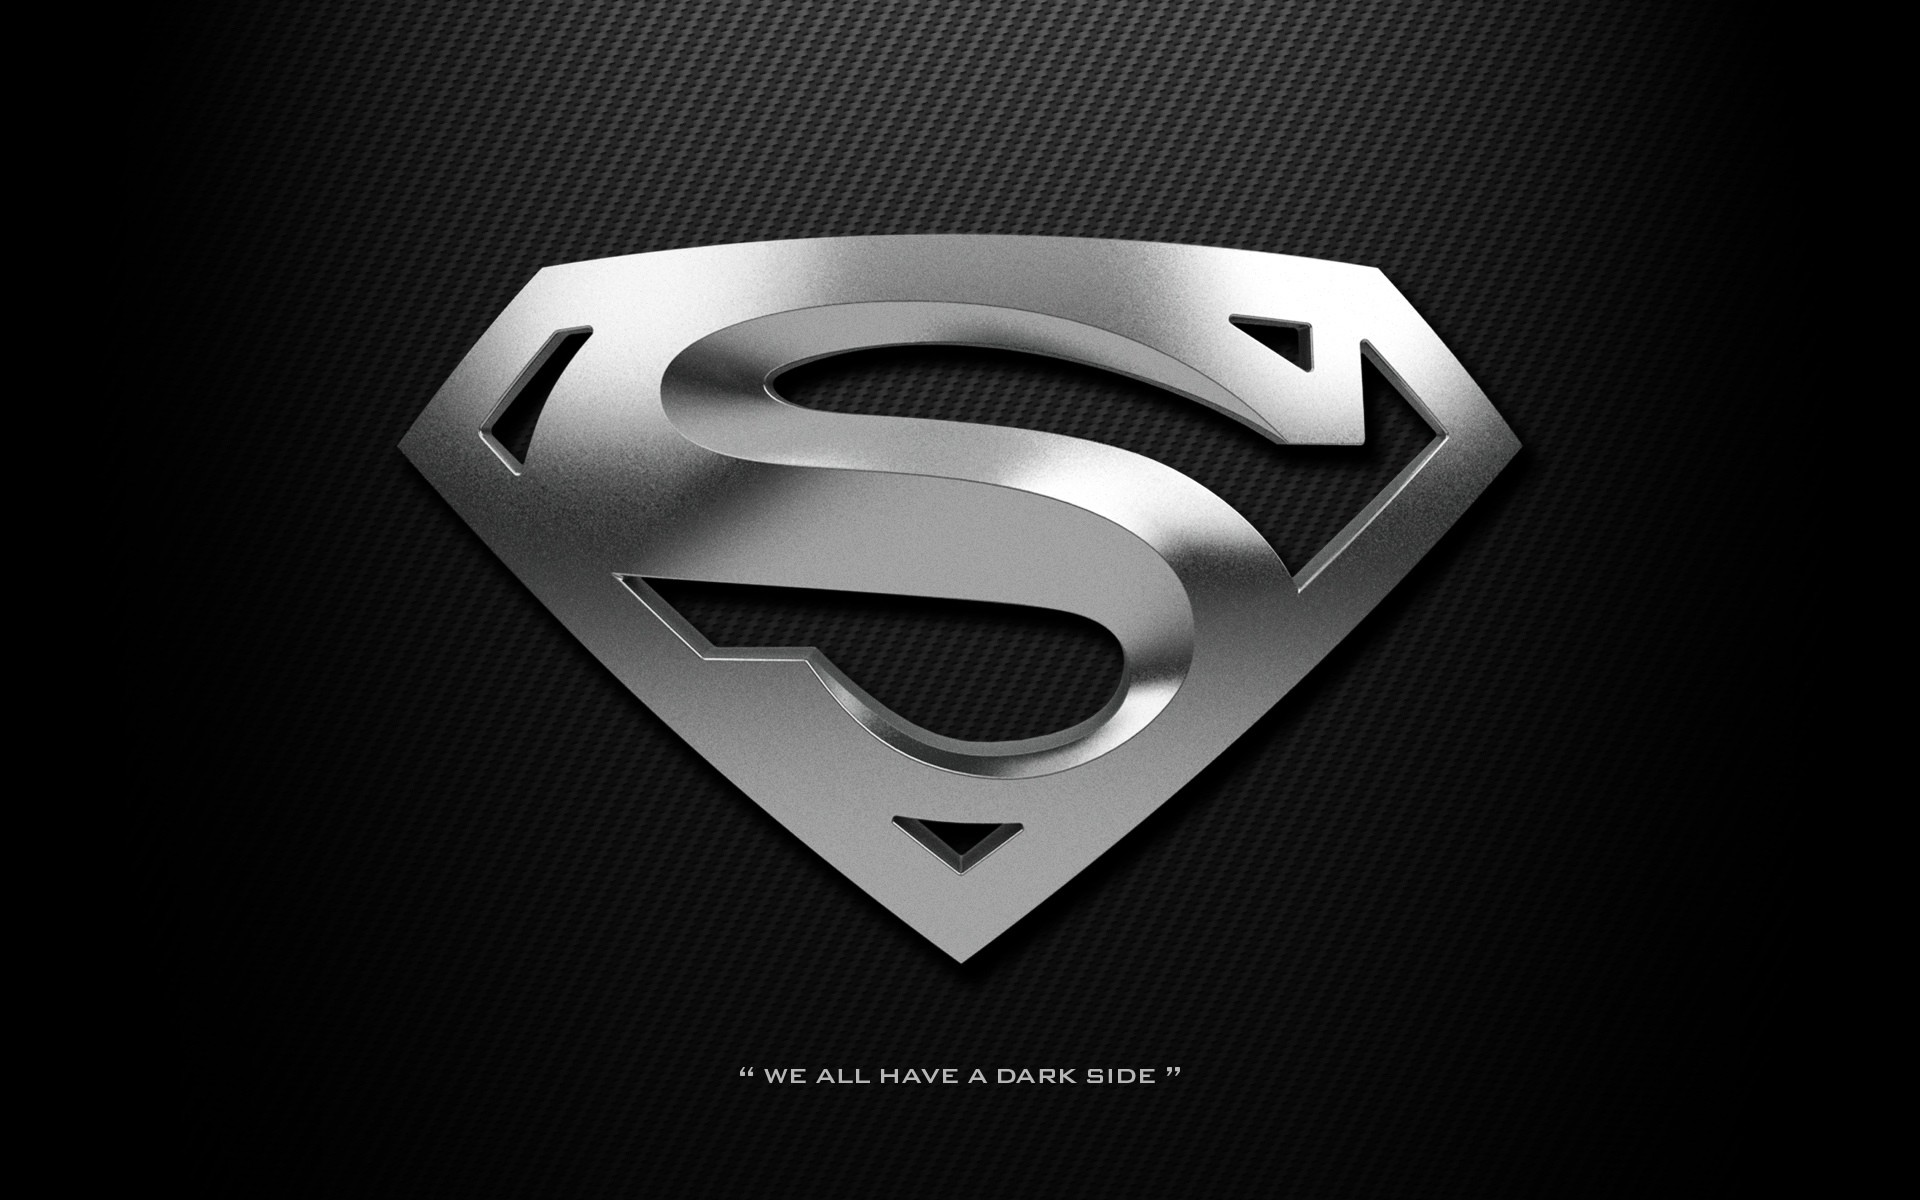 Superman logo wallpaper HD black dark silver chrome carbon We all 1920x1200